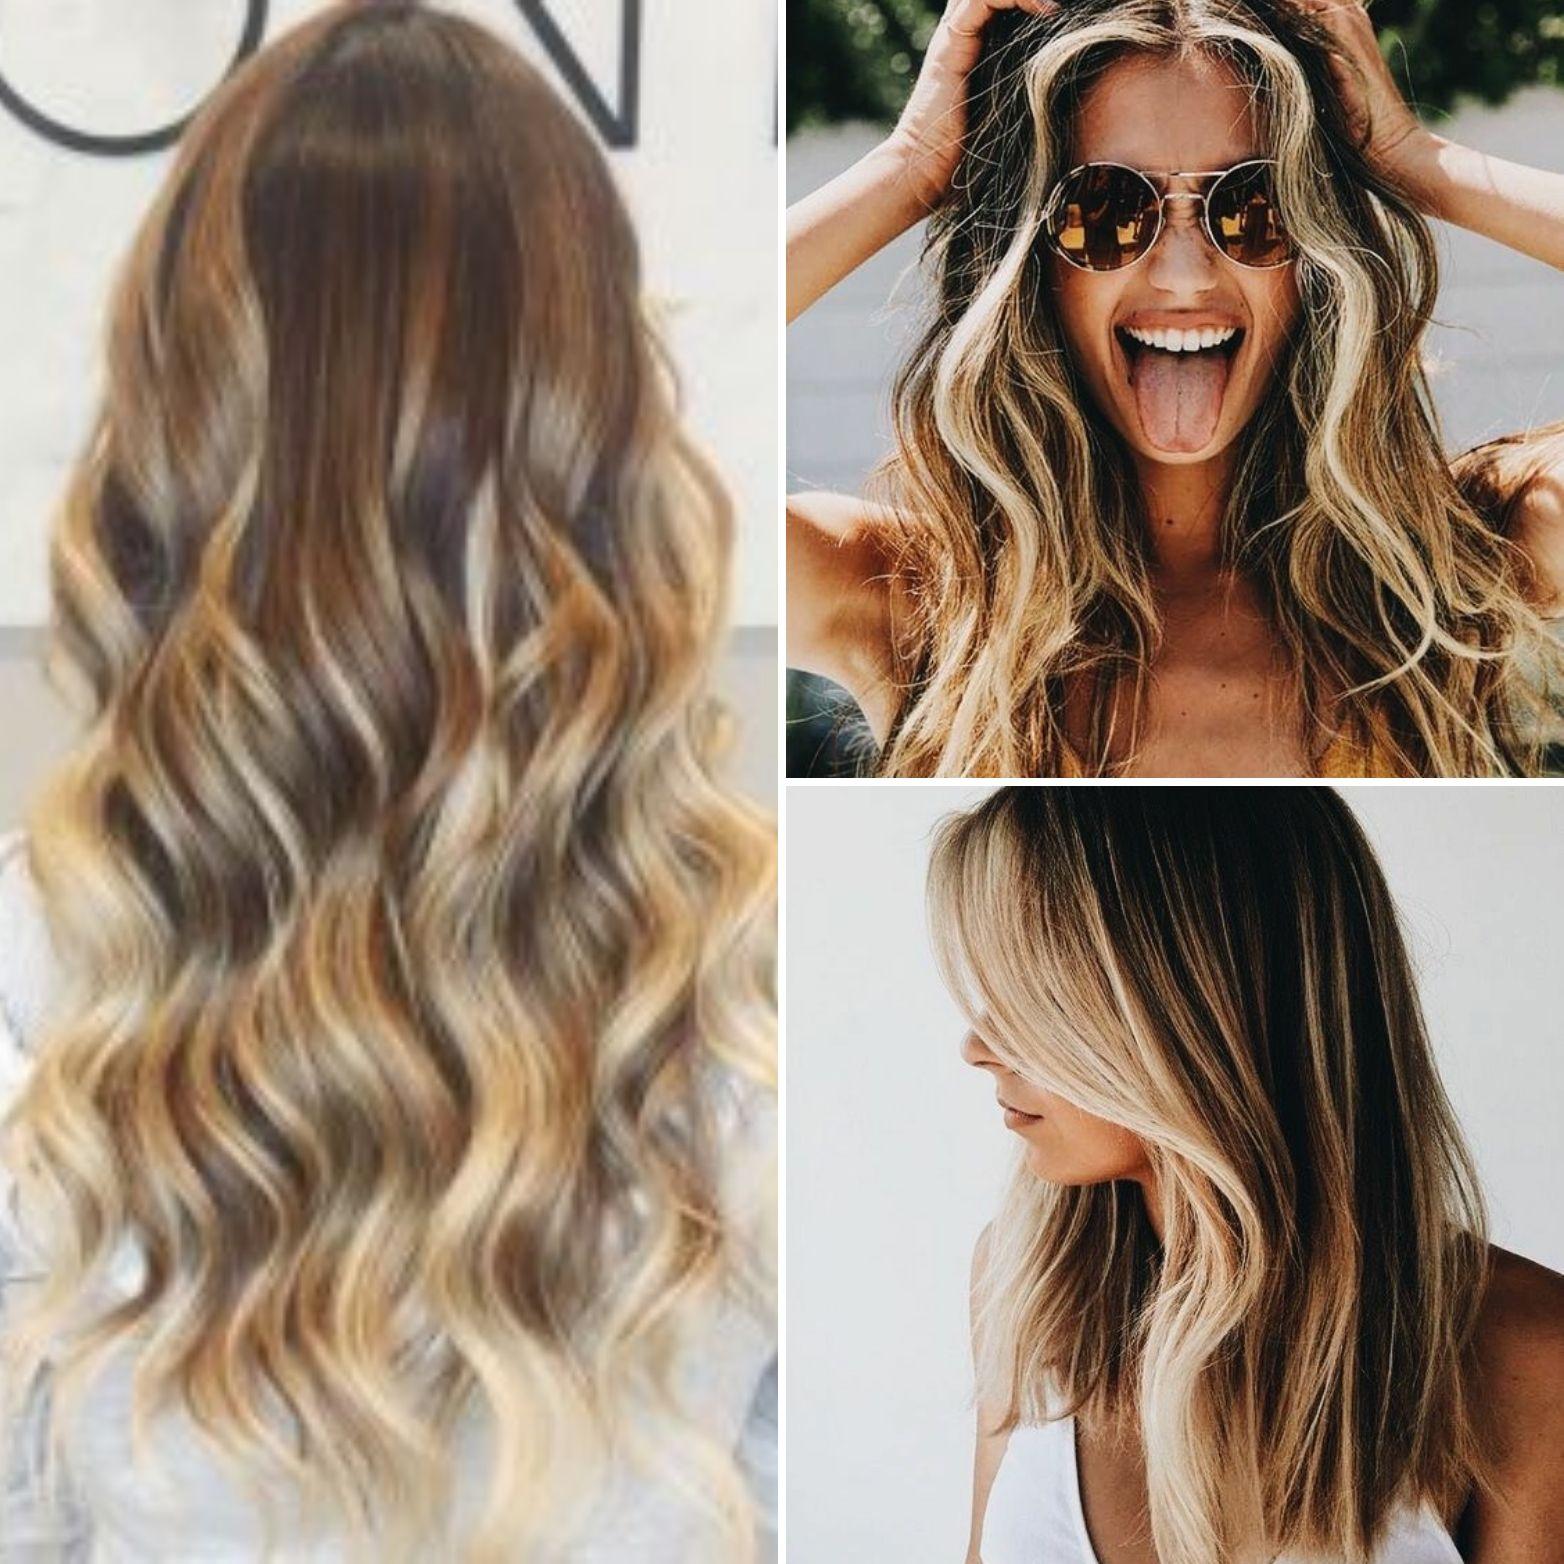 dress - Bronze Caramel hair color video